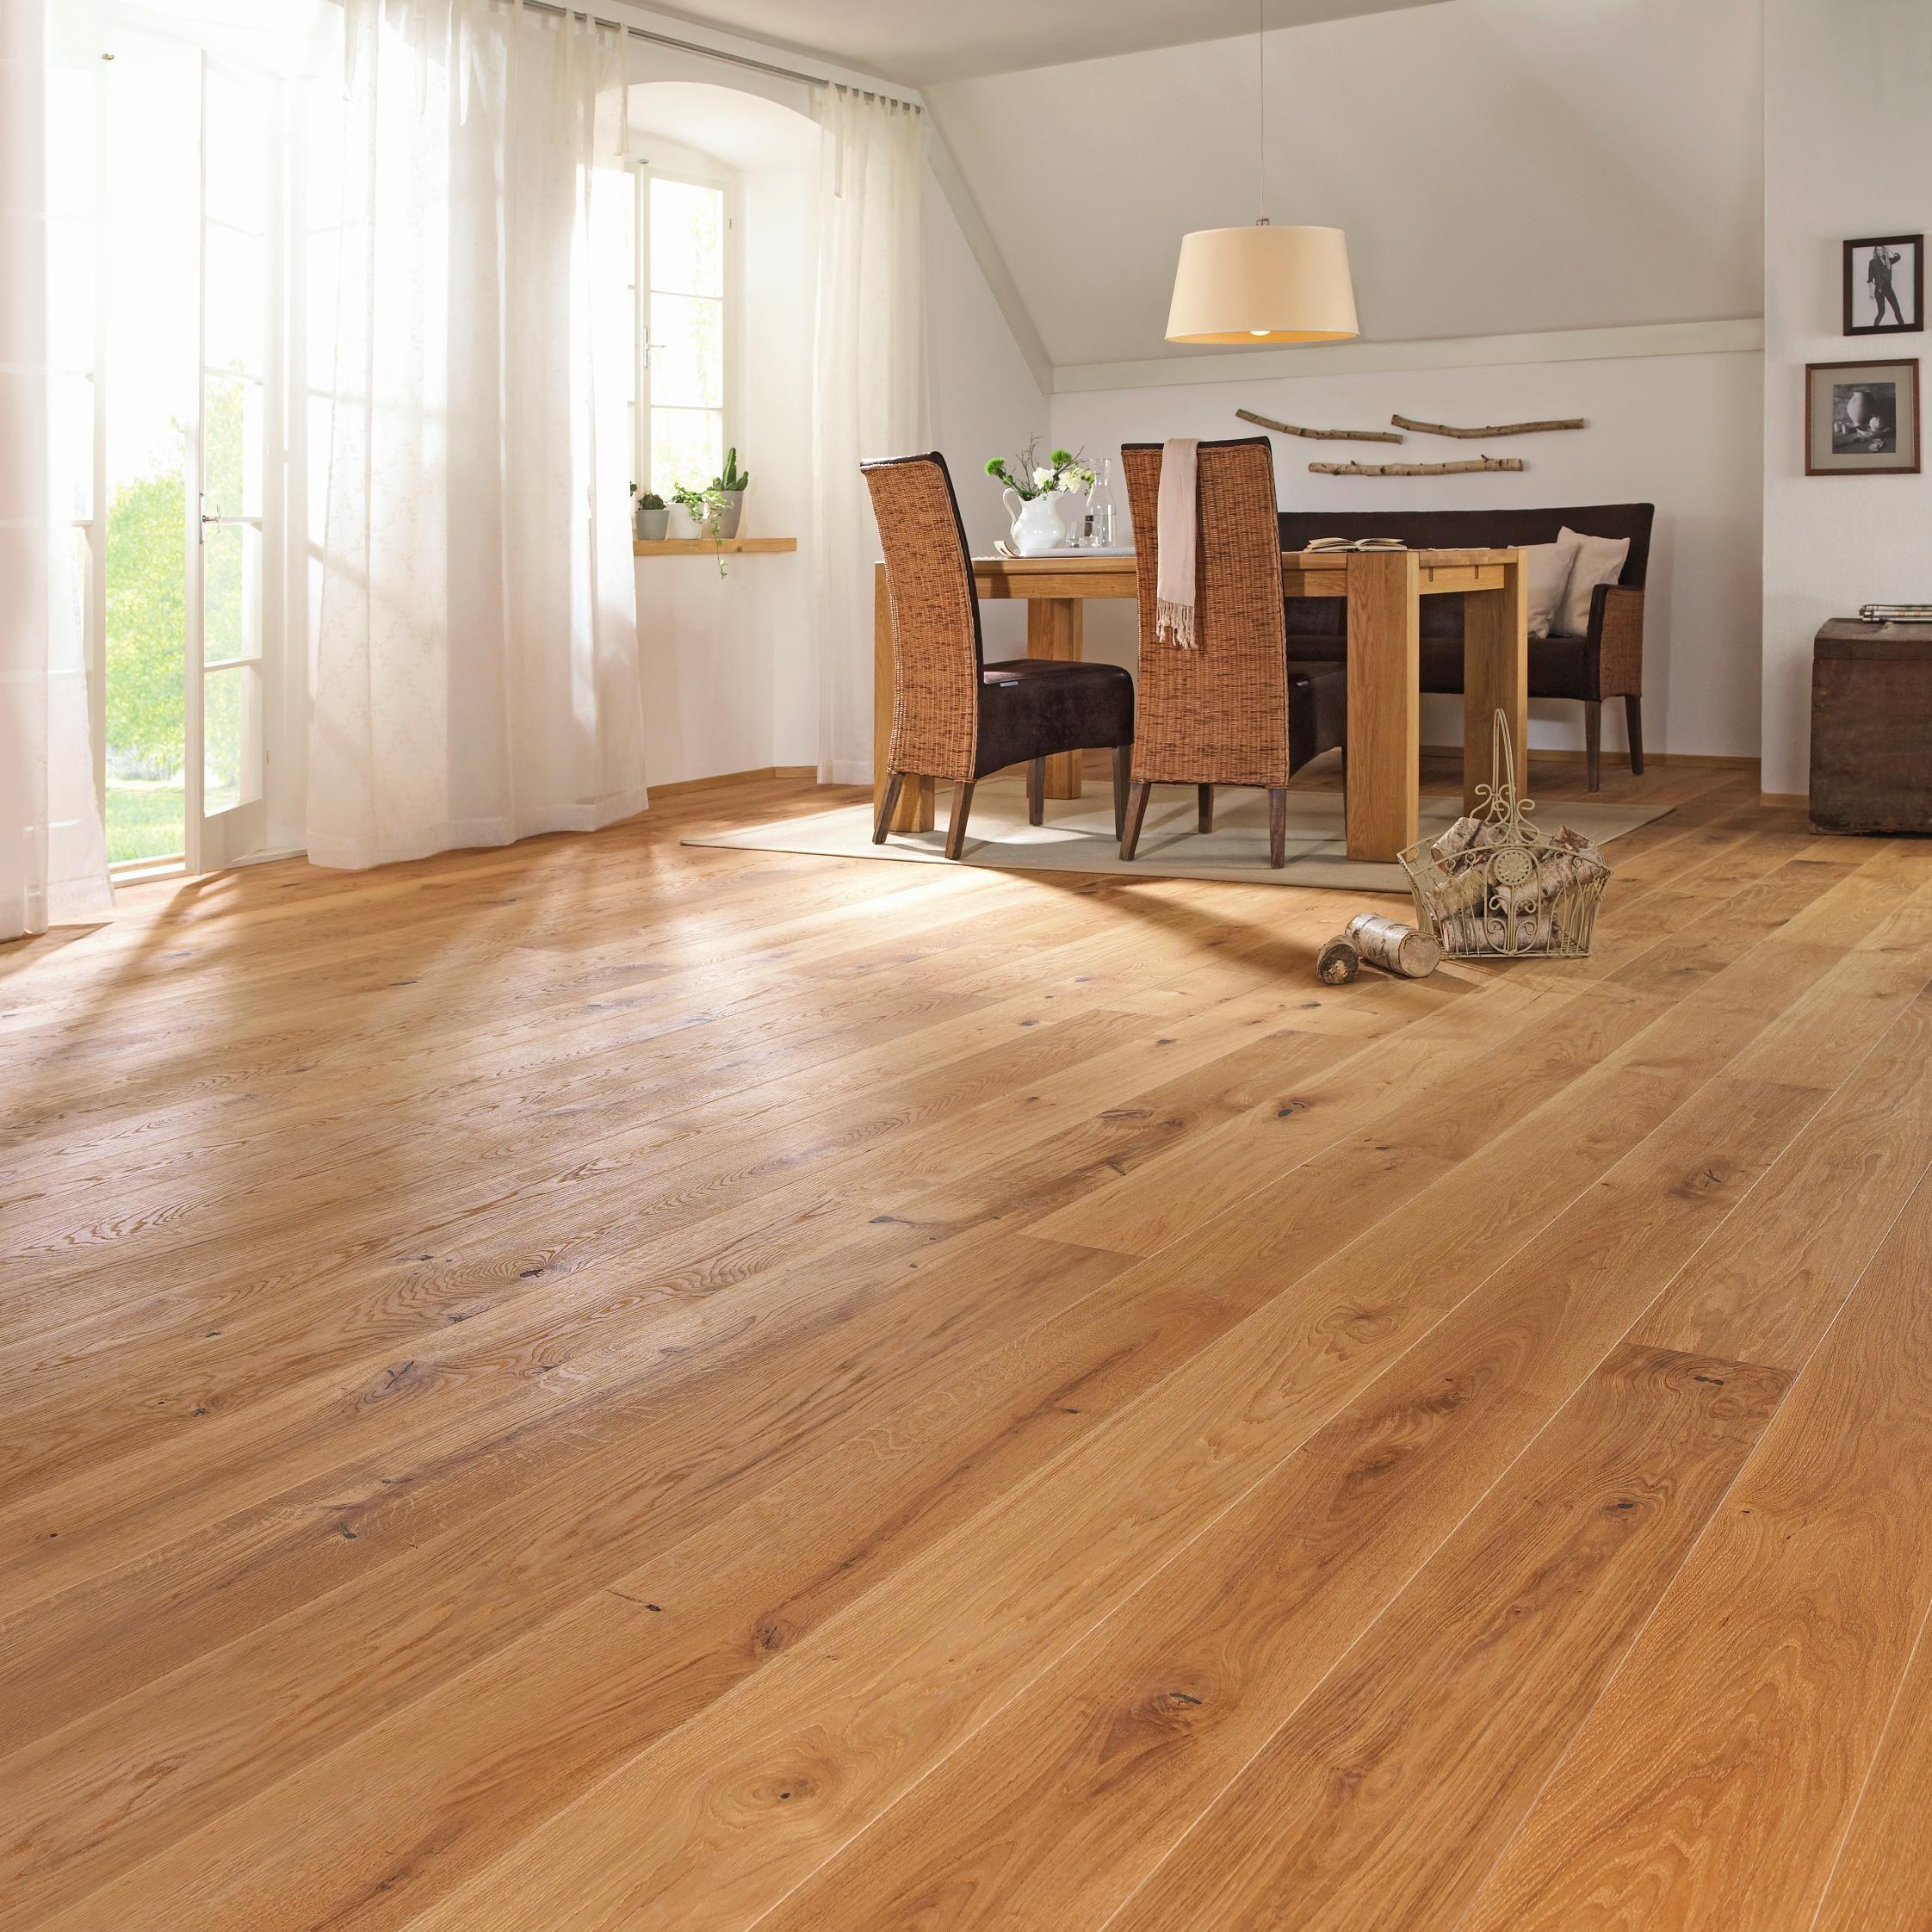 parkett landhausdiele eiche per m b den parkett laminat und vinyl pinterest parkett. Black Bedroom Furniture Sets. Home Design Ideas